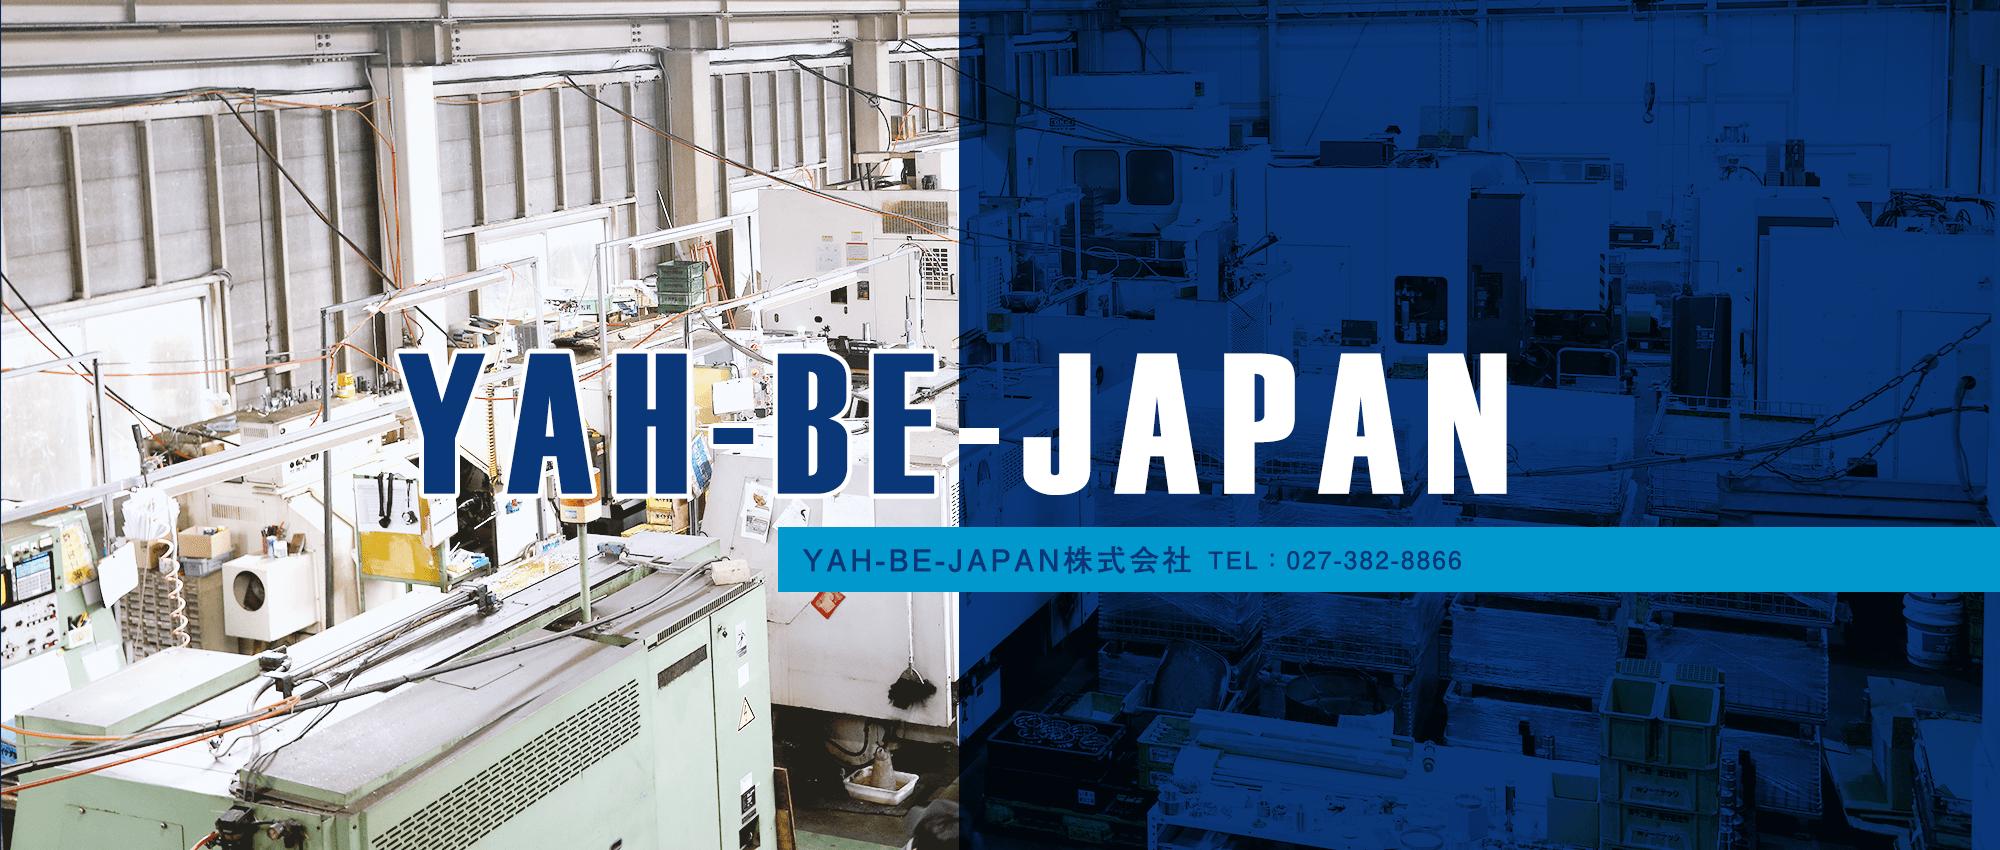 YAH-BE-JAPAN株式会社